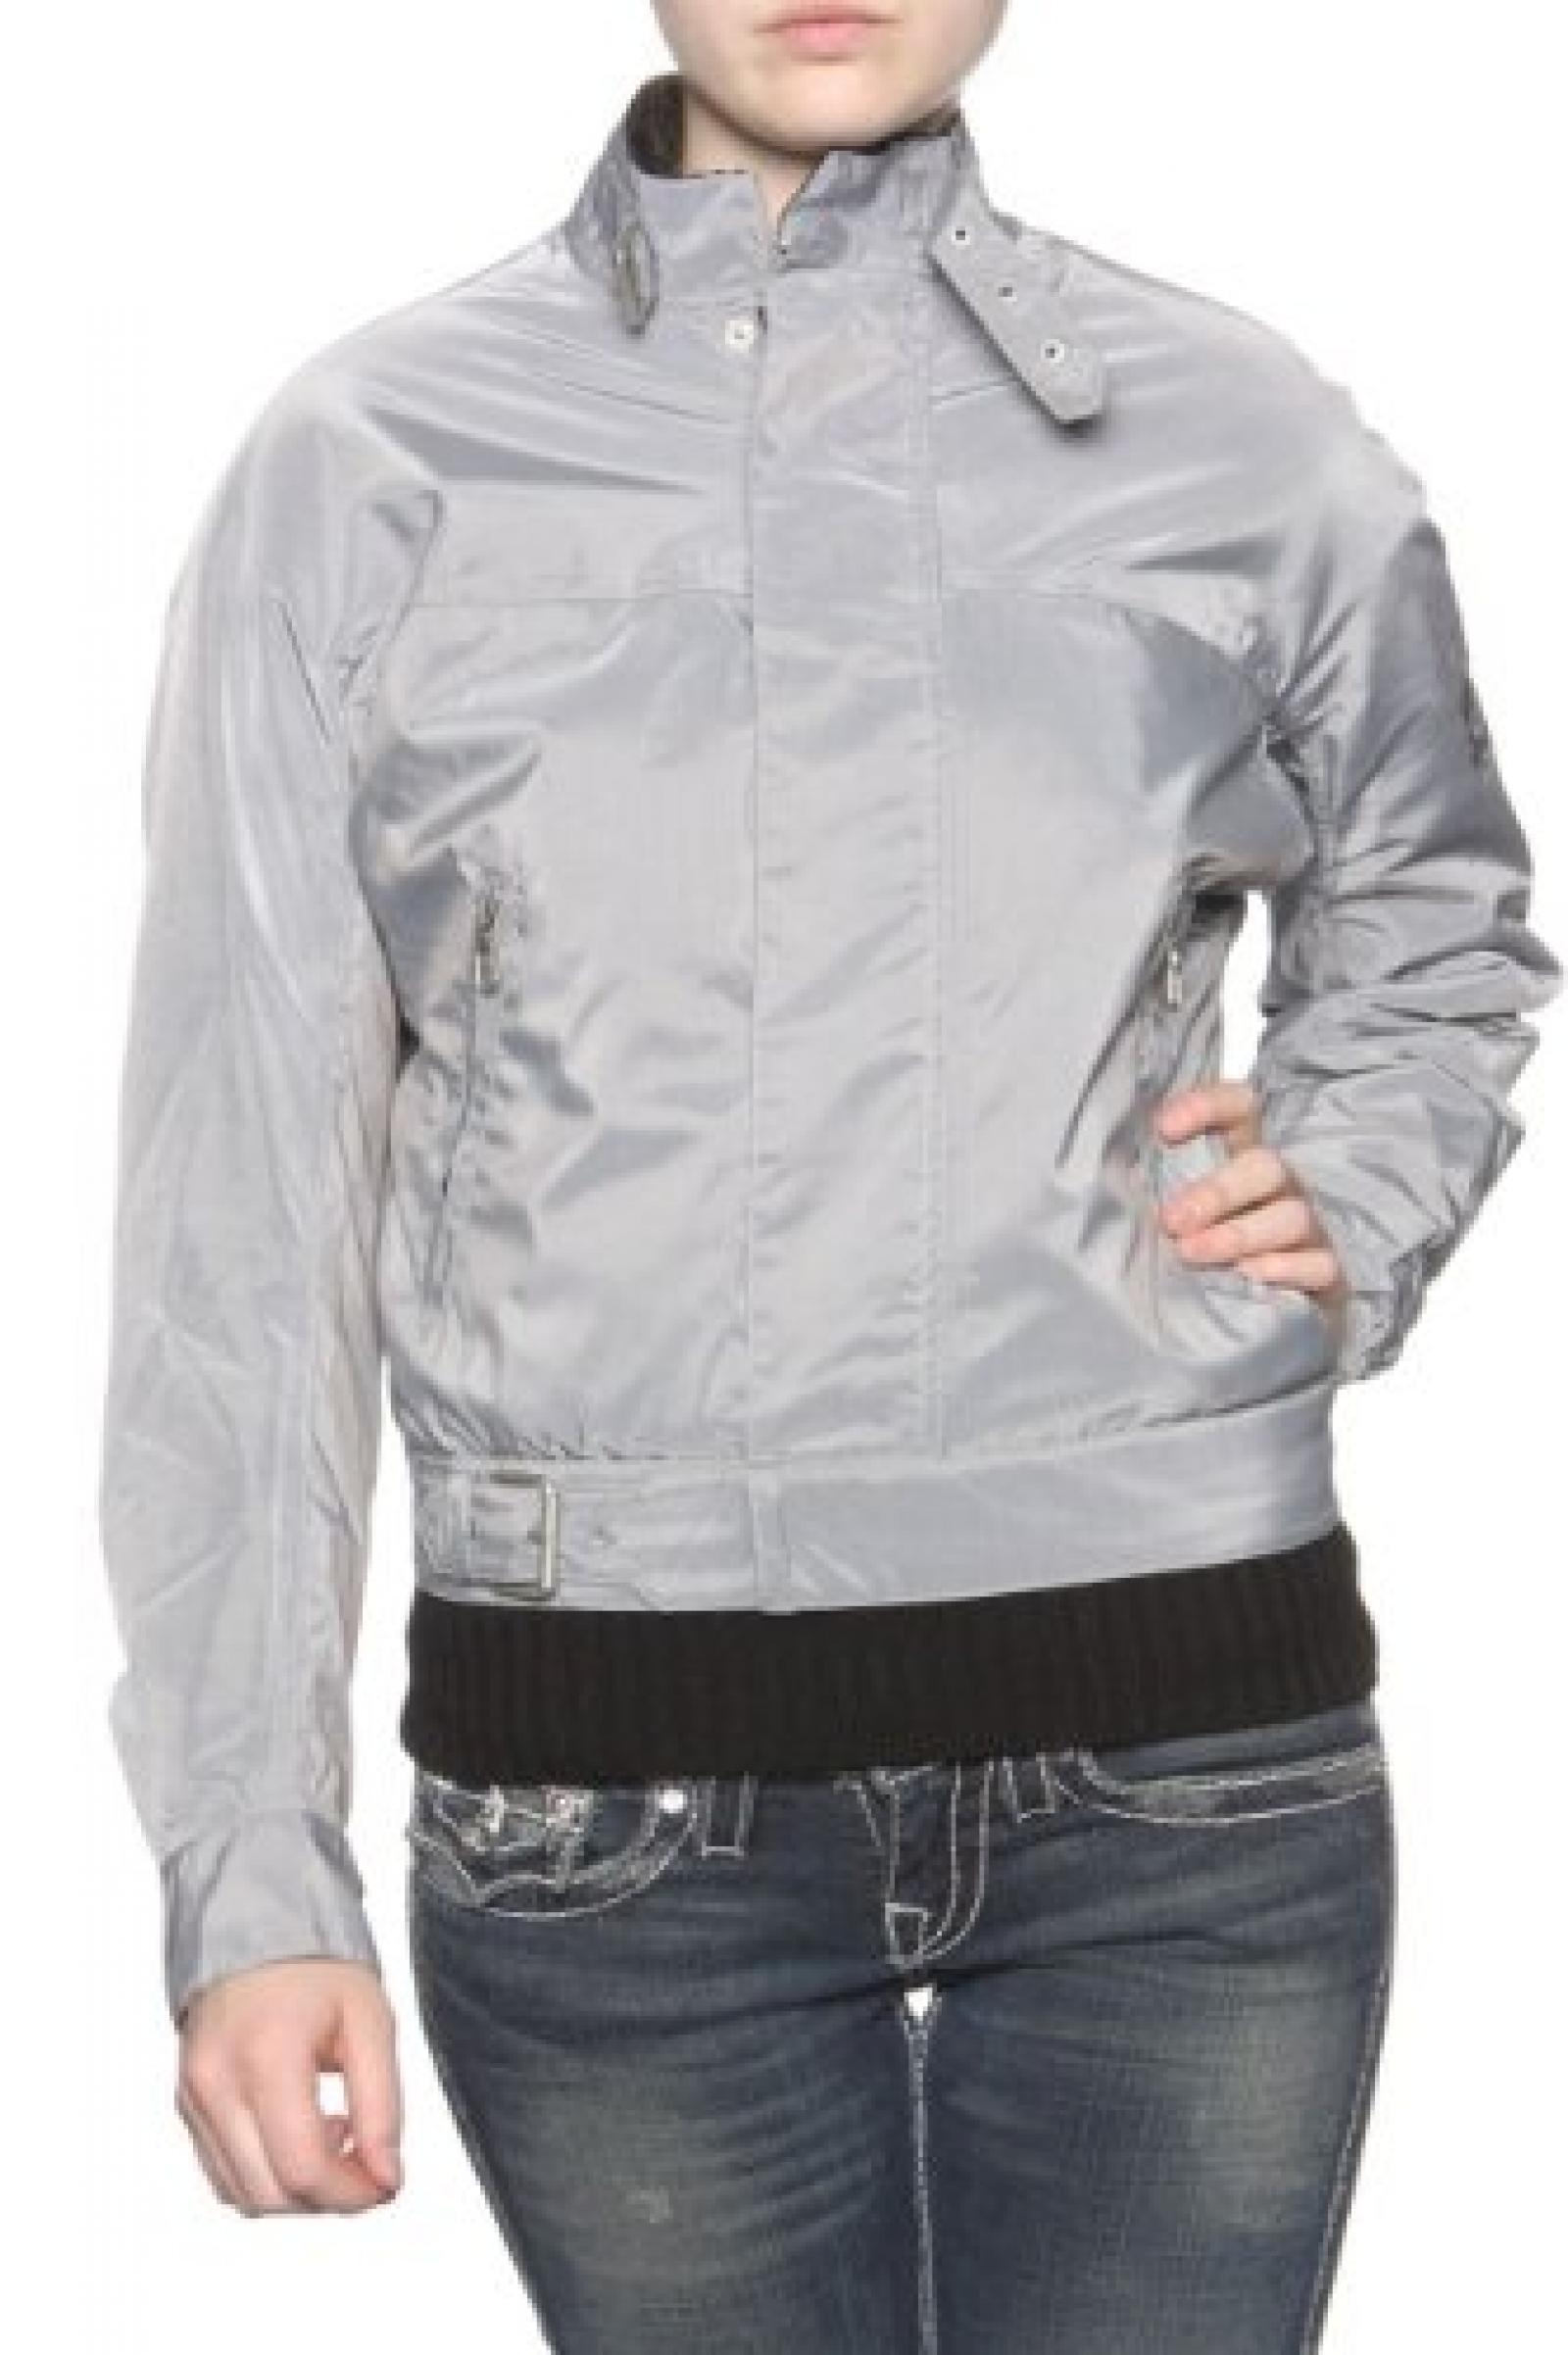 Belstaff Damen Jacke Blouson-Jacke PIRAT BLOUSON DE LUXE, Farbe: Grau